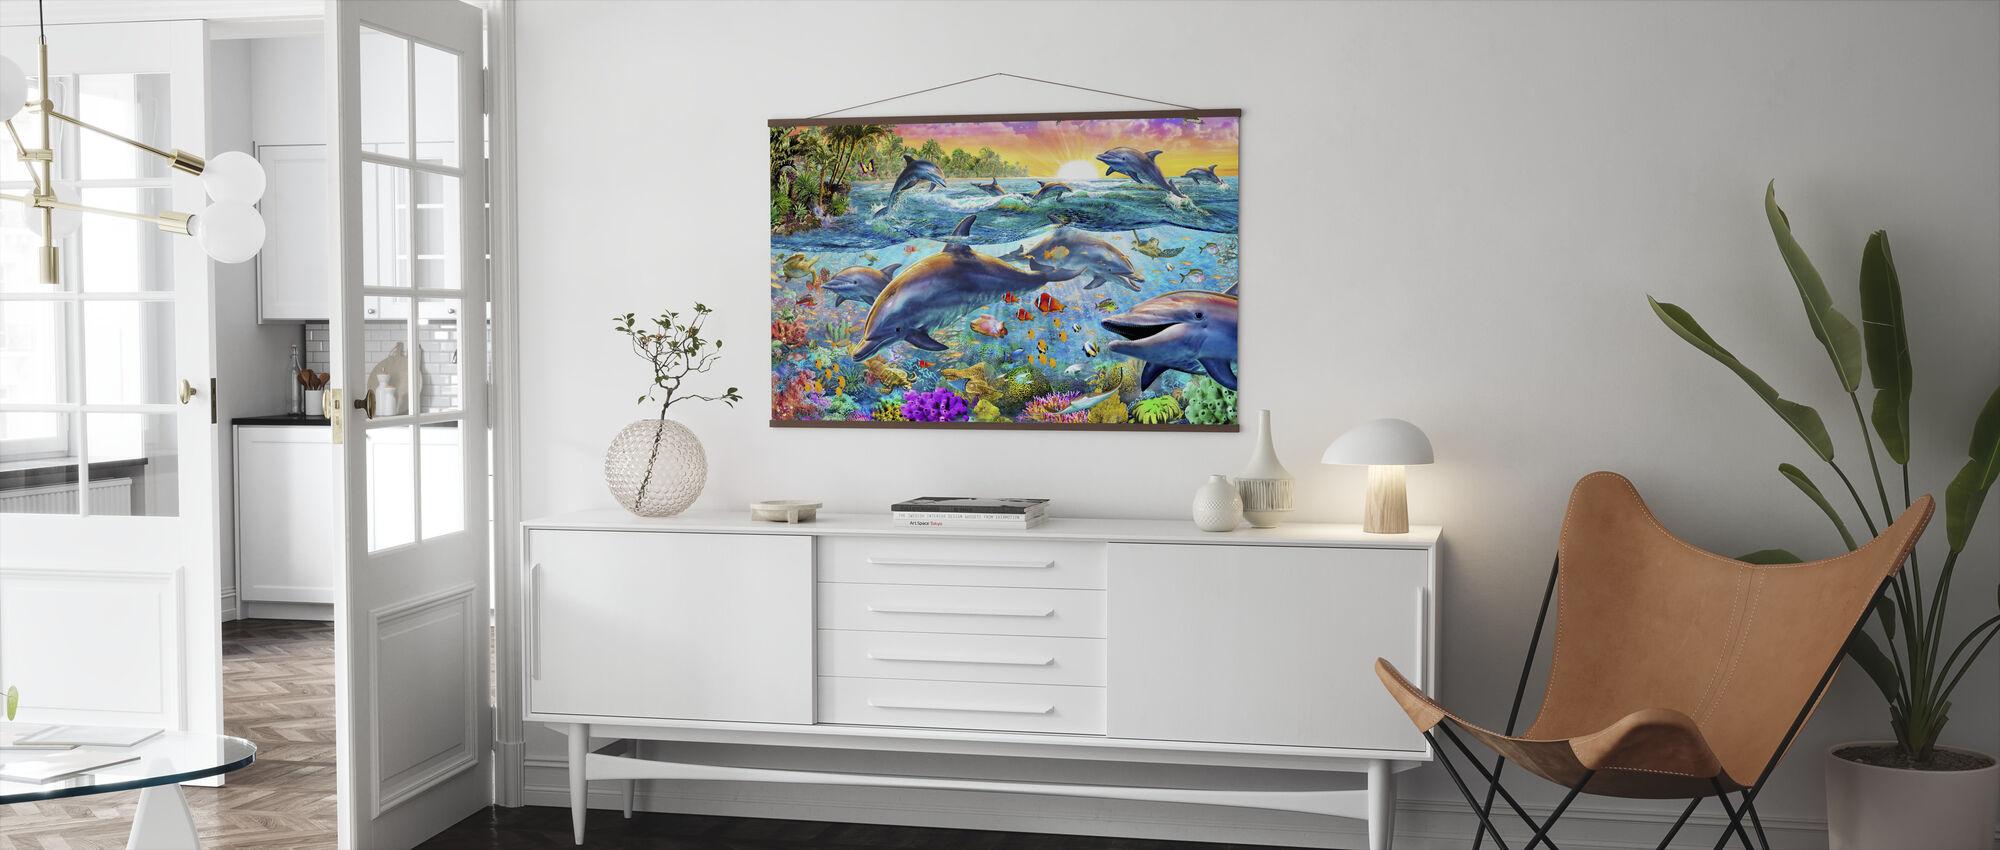 Tropiska delfiner - Poster - Vardagsrum